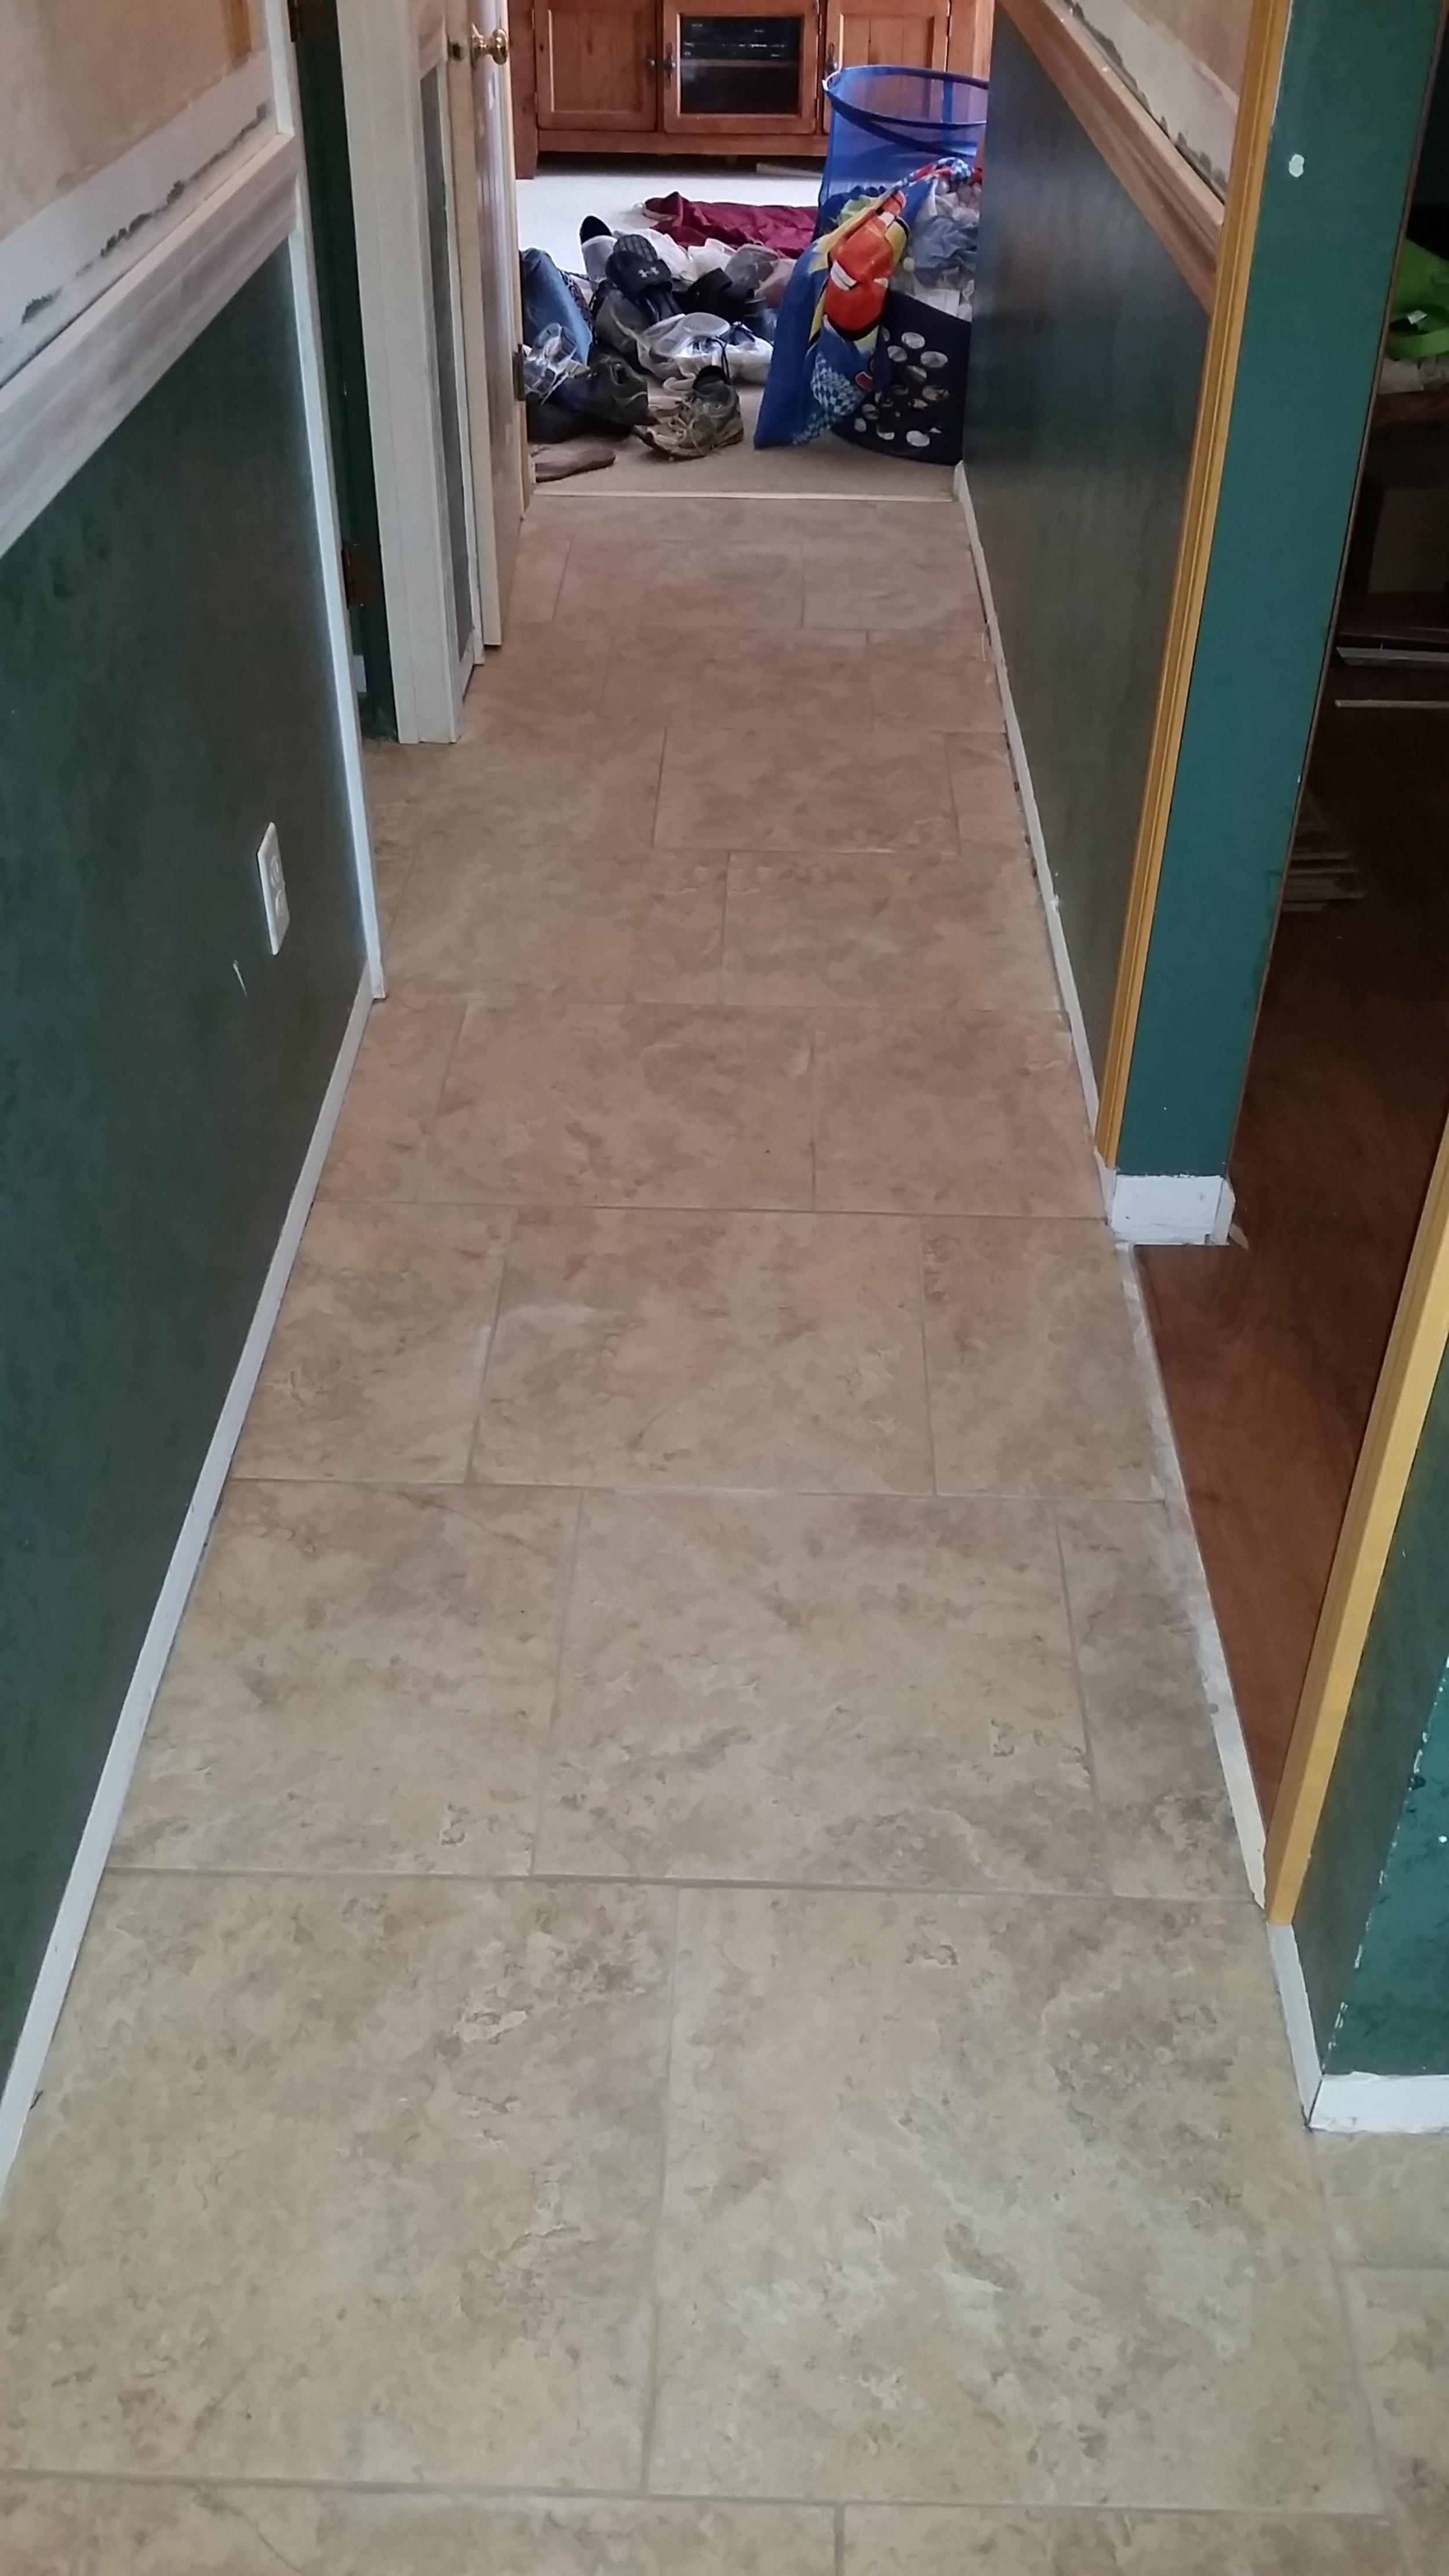 "18""x18"" hallway tiles 1/4 offset pattern"